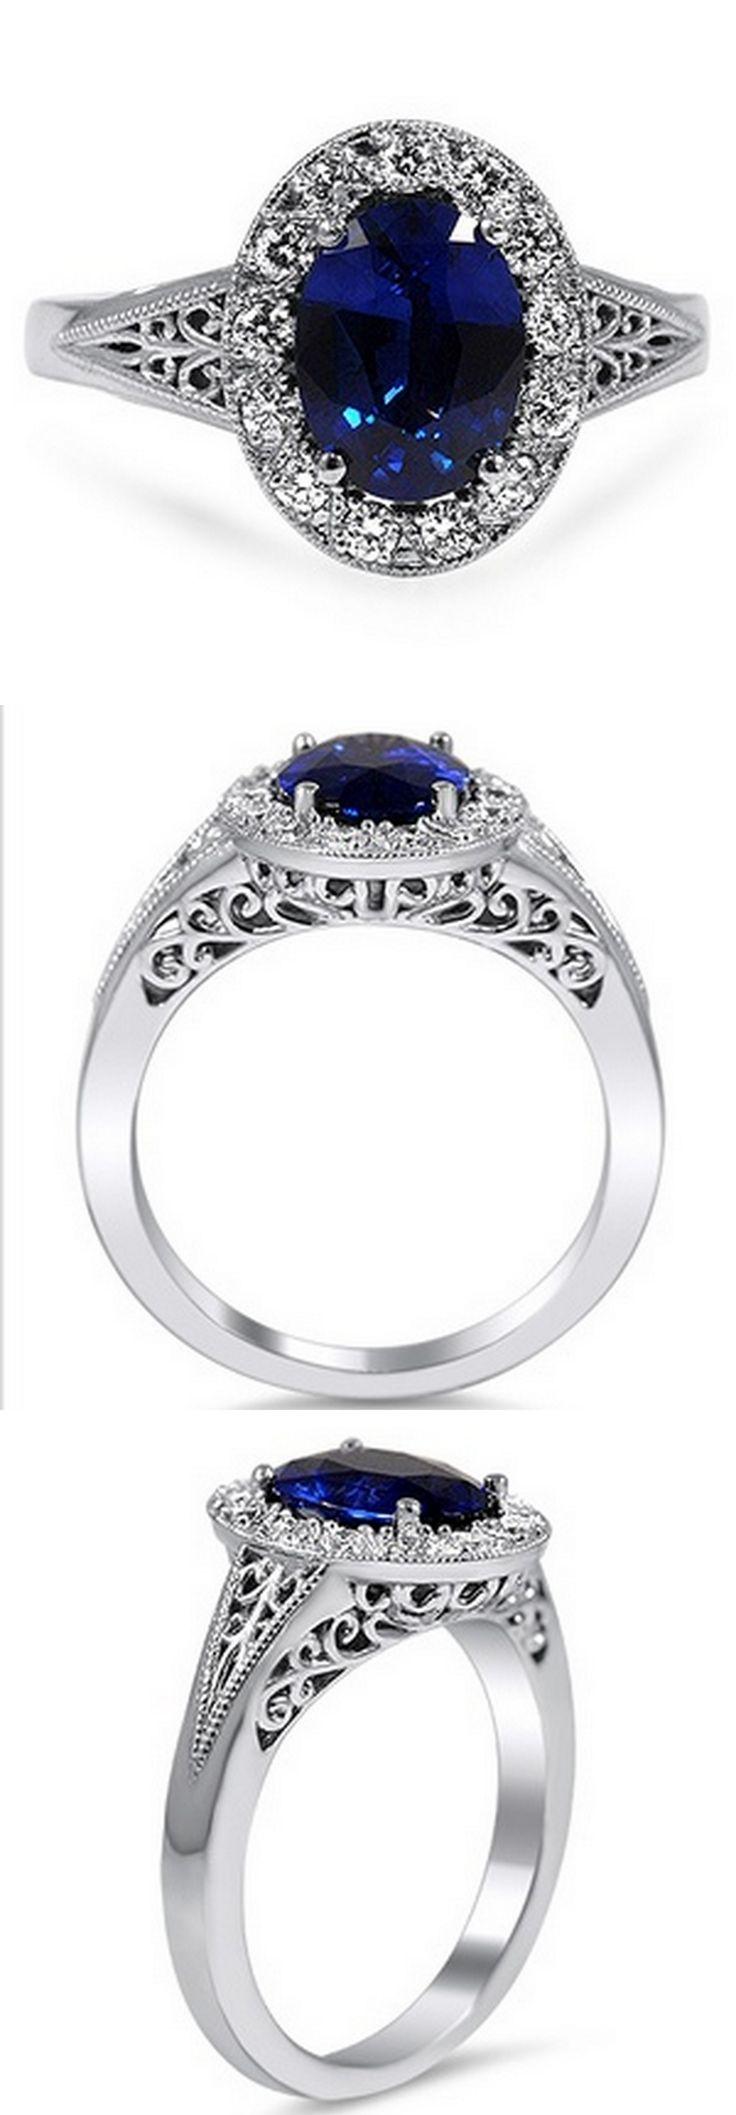 Ornate Filigree Halo Ring